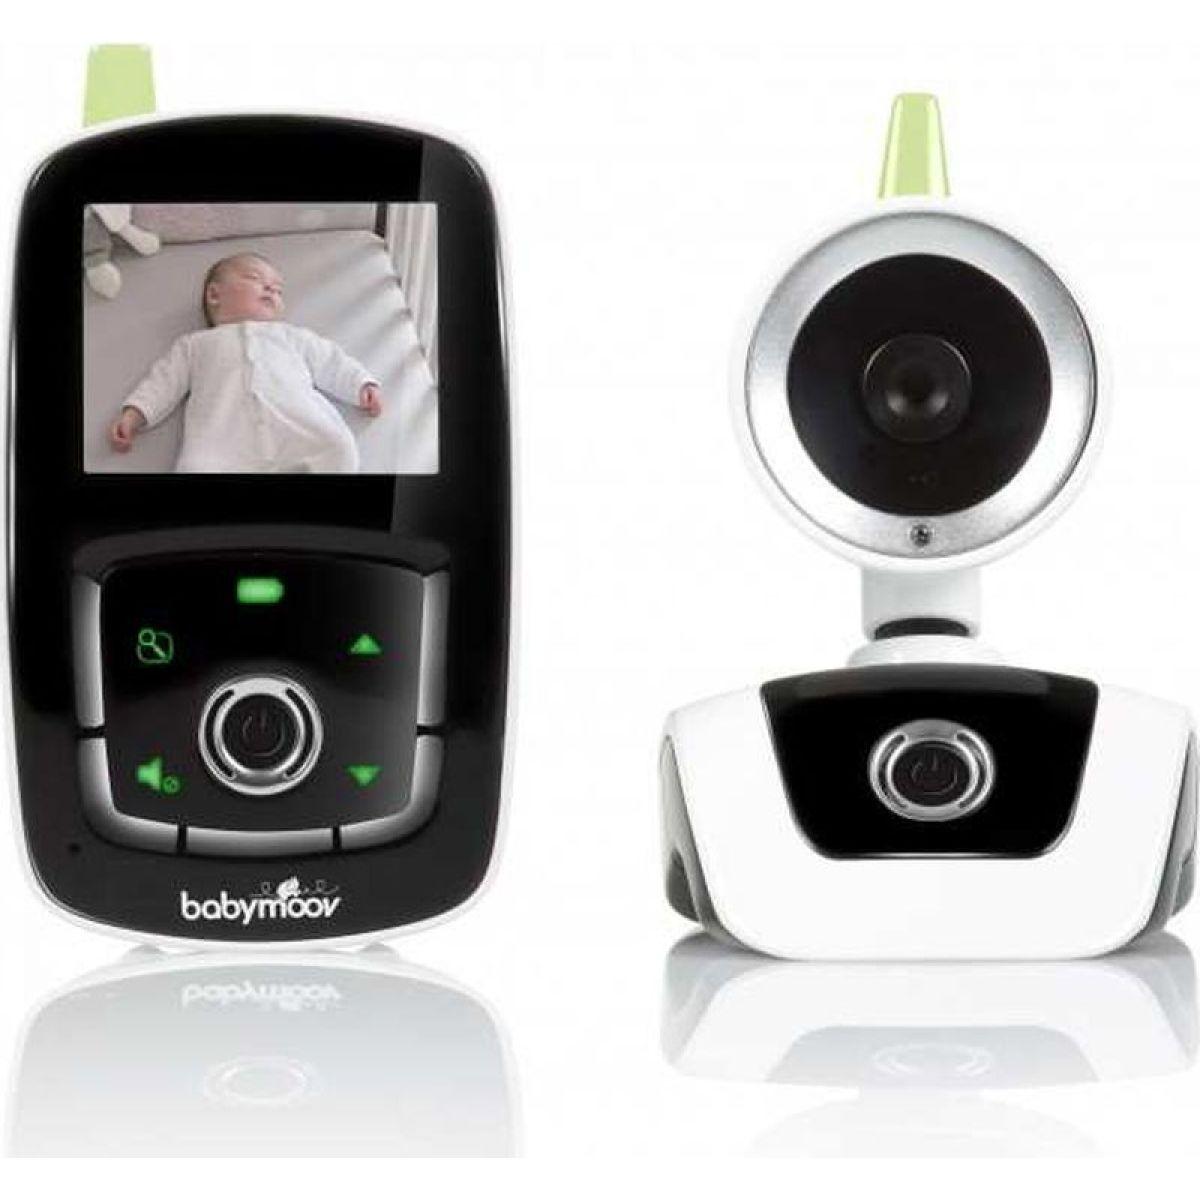 Babymoov VISIO CARE III 2015 čierna/biela/zelená